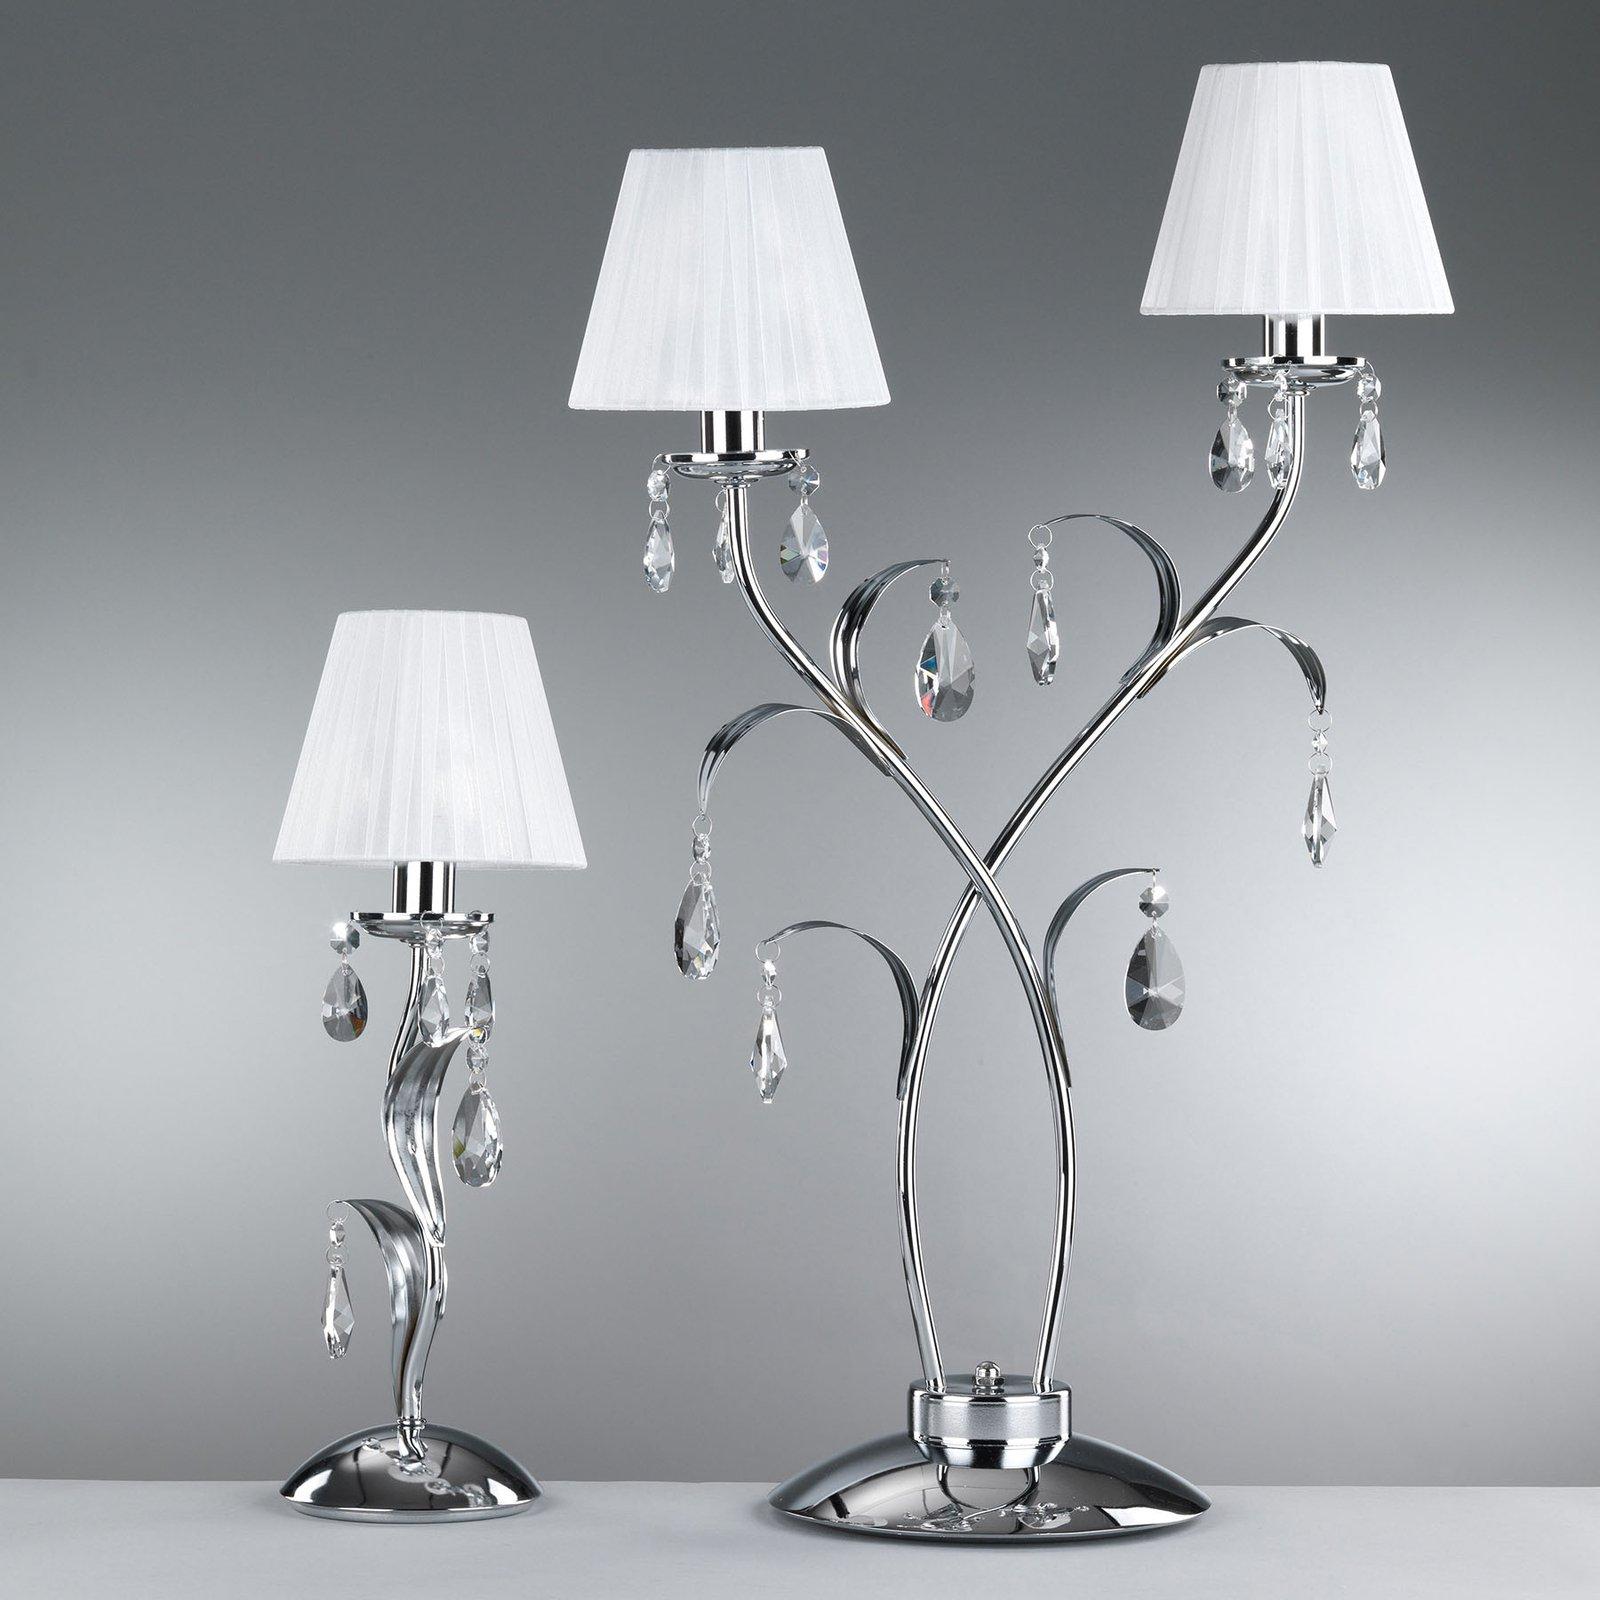 Bordlampe Jacqueline, 2 lyskilder, hvit